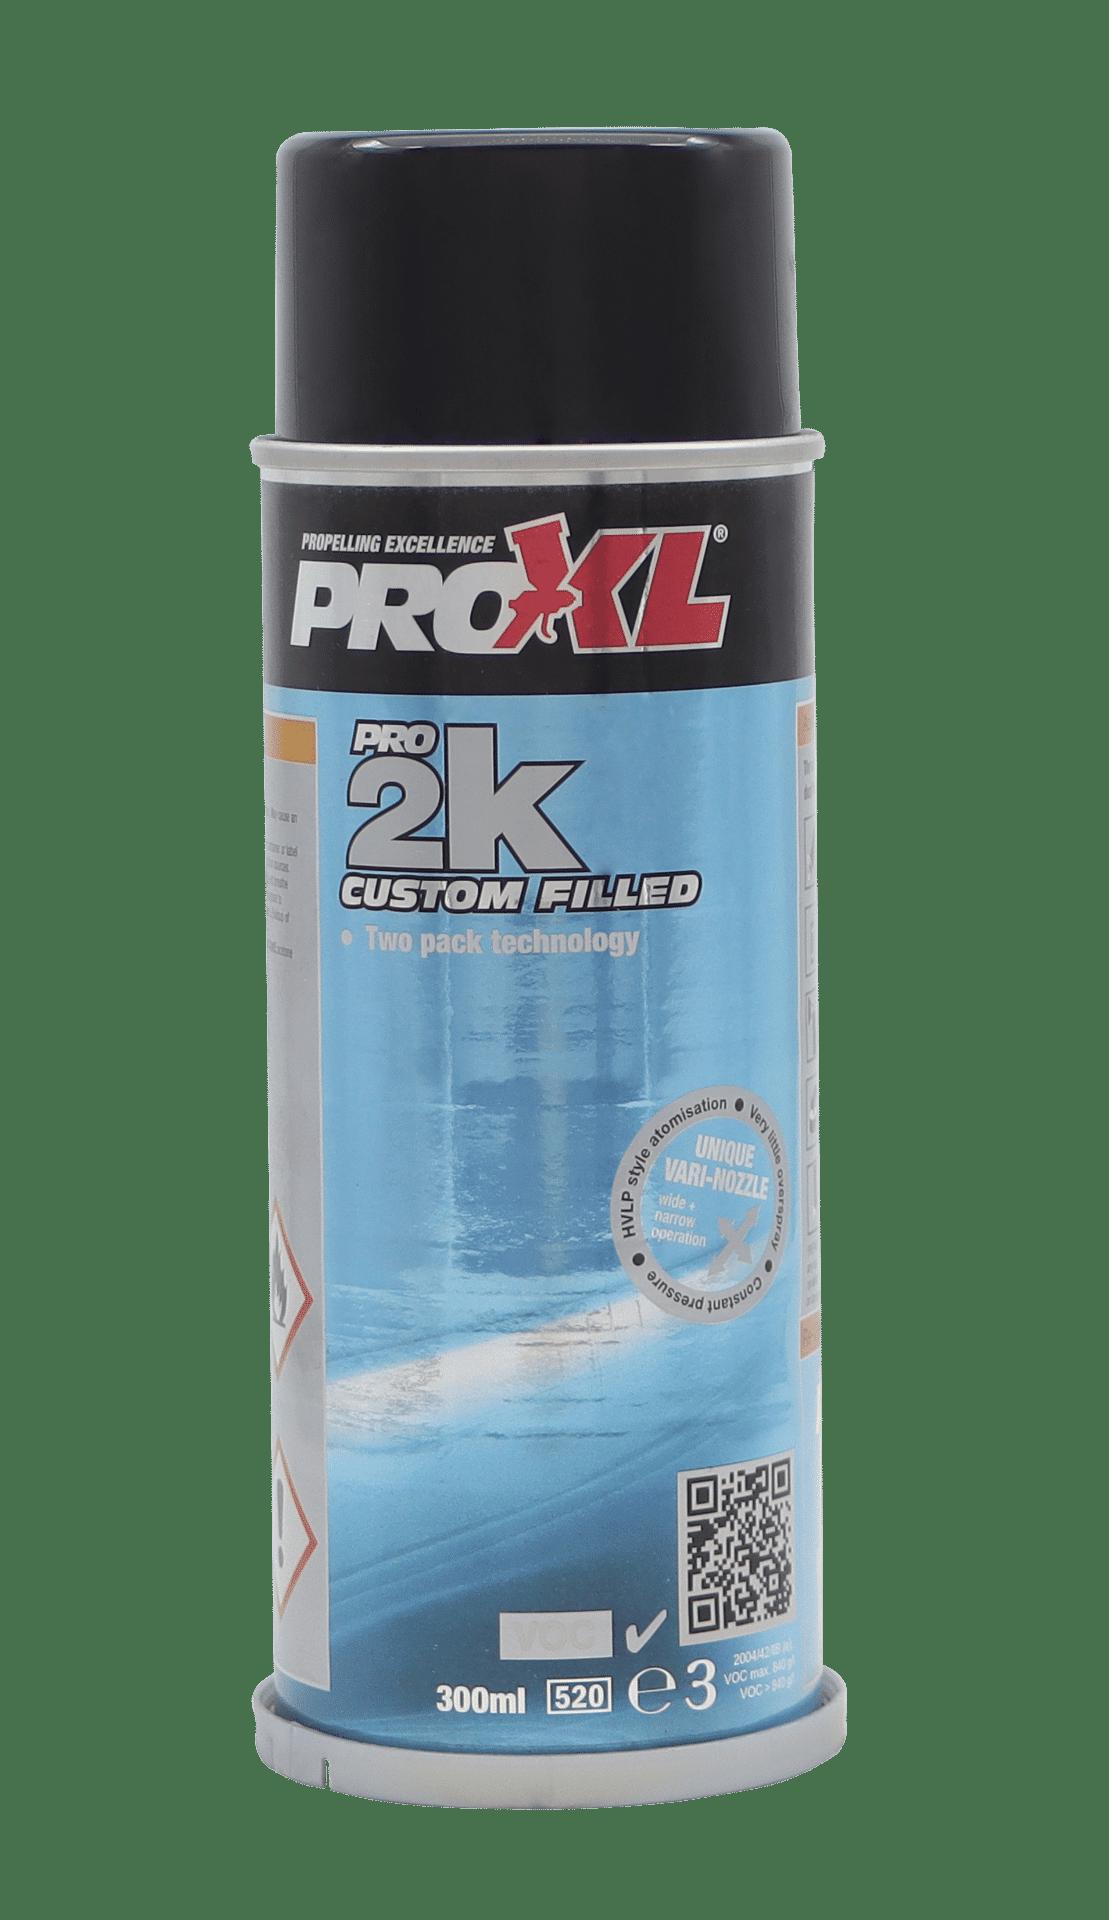 2K Pre-Gassed Aerosol (300ml) Product Image